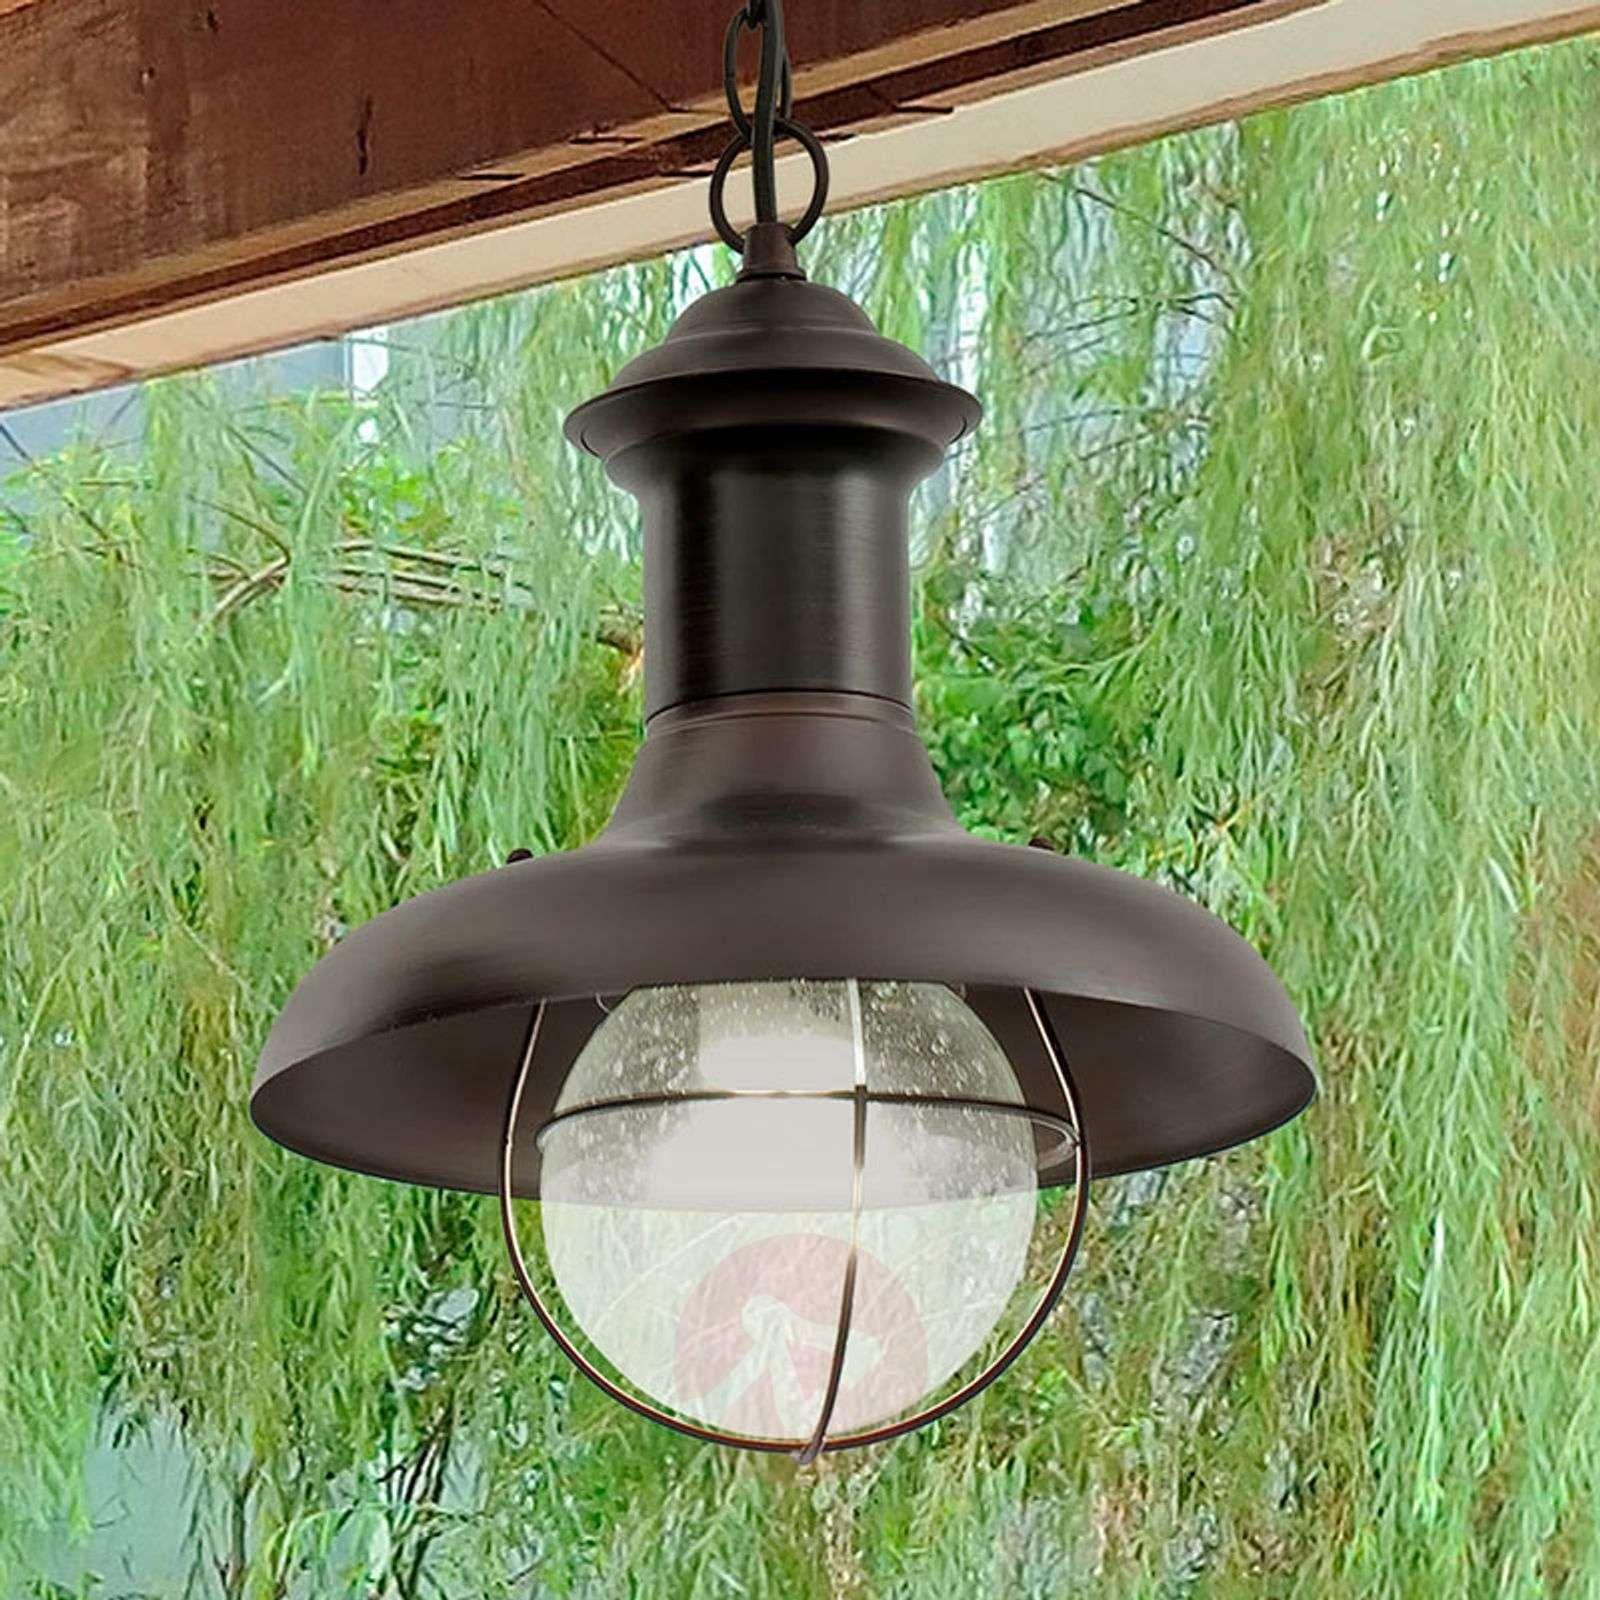 Lampa Wisząca Zewnętrzna Estoril P Hanging Lights Light Pendant Light